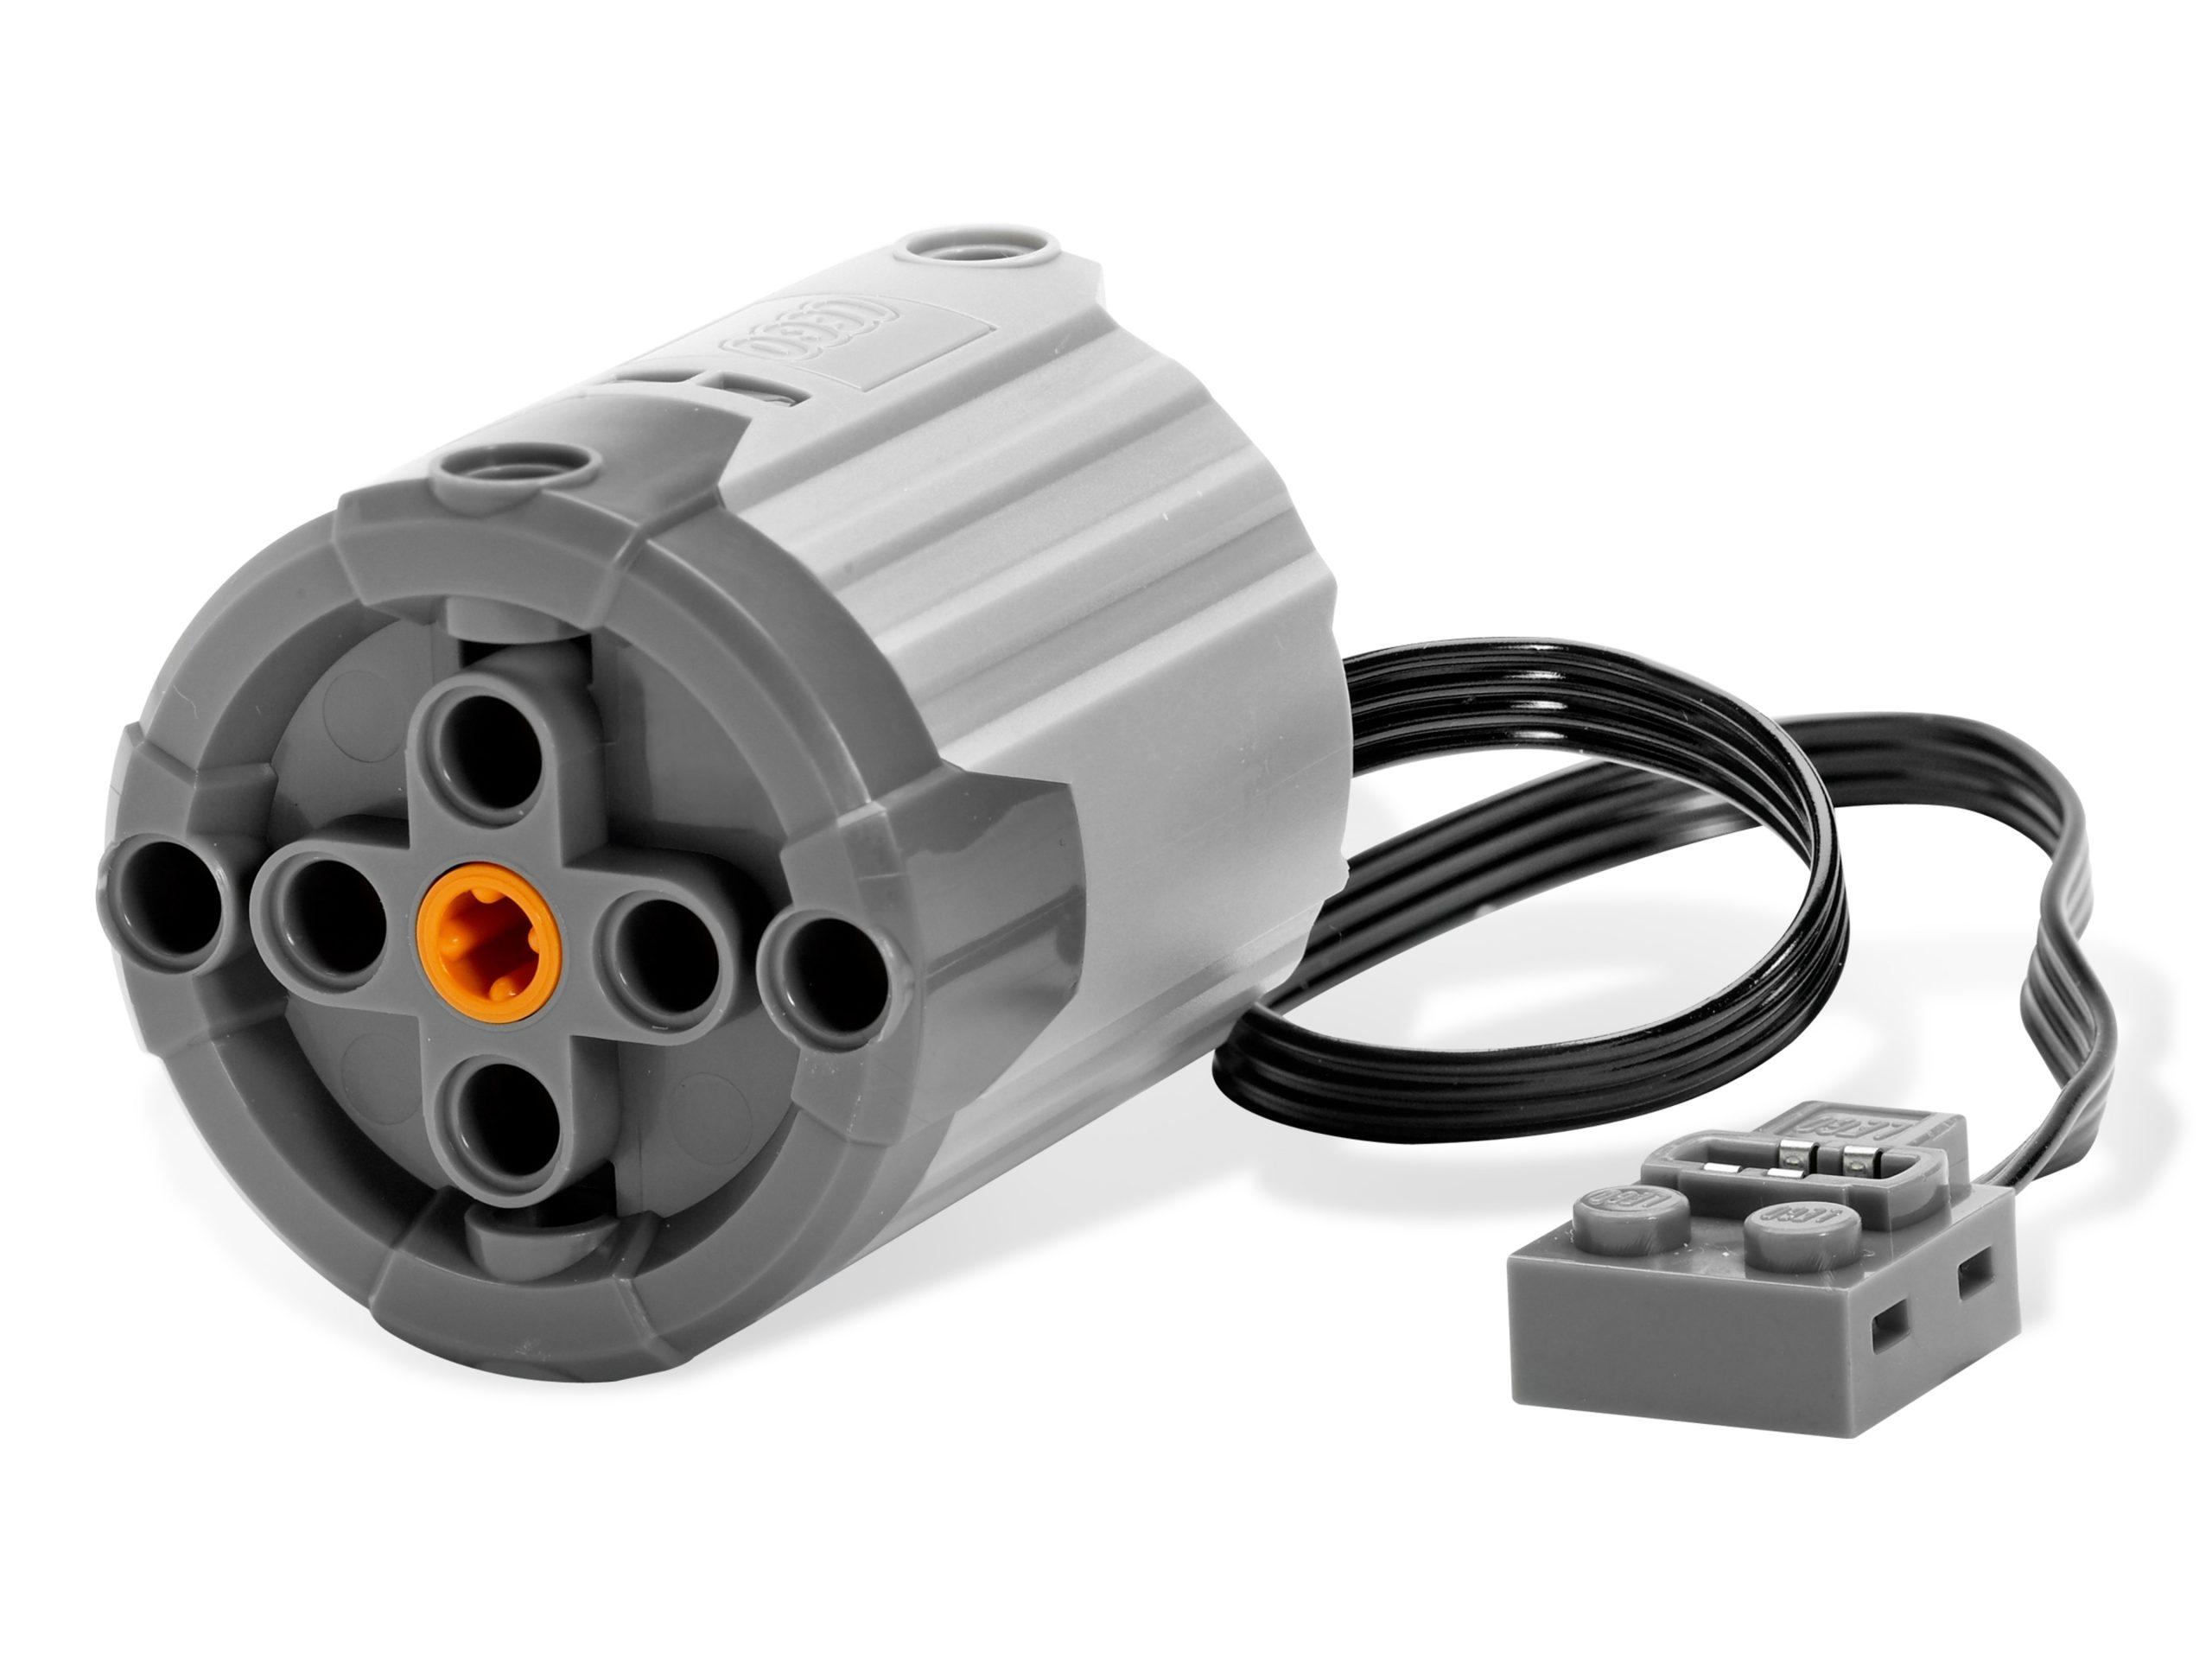 moteur xl power fonctions lego 8882 scaled